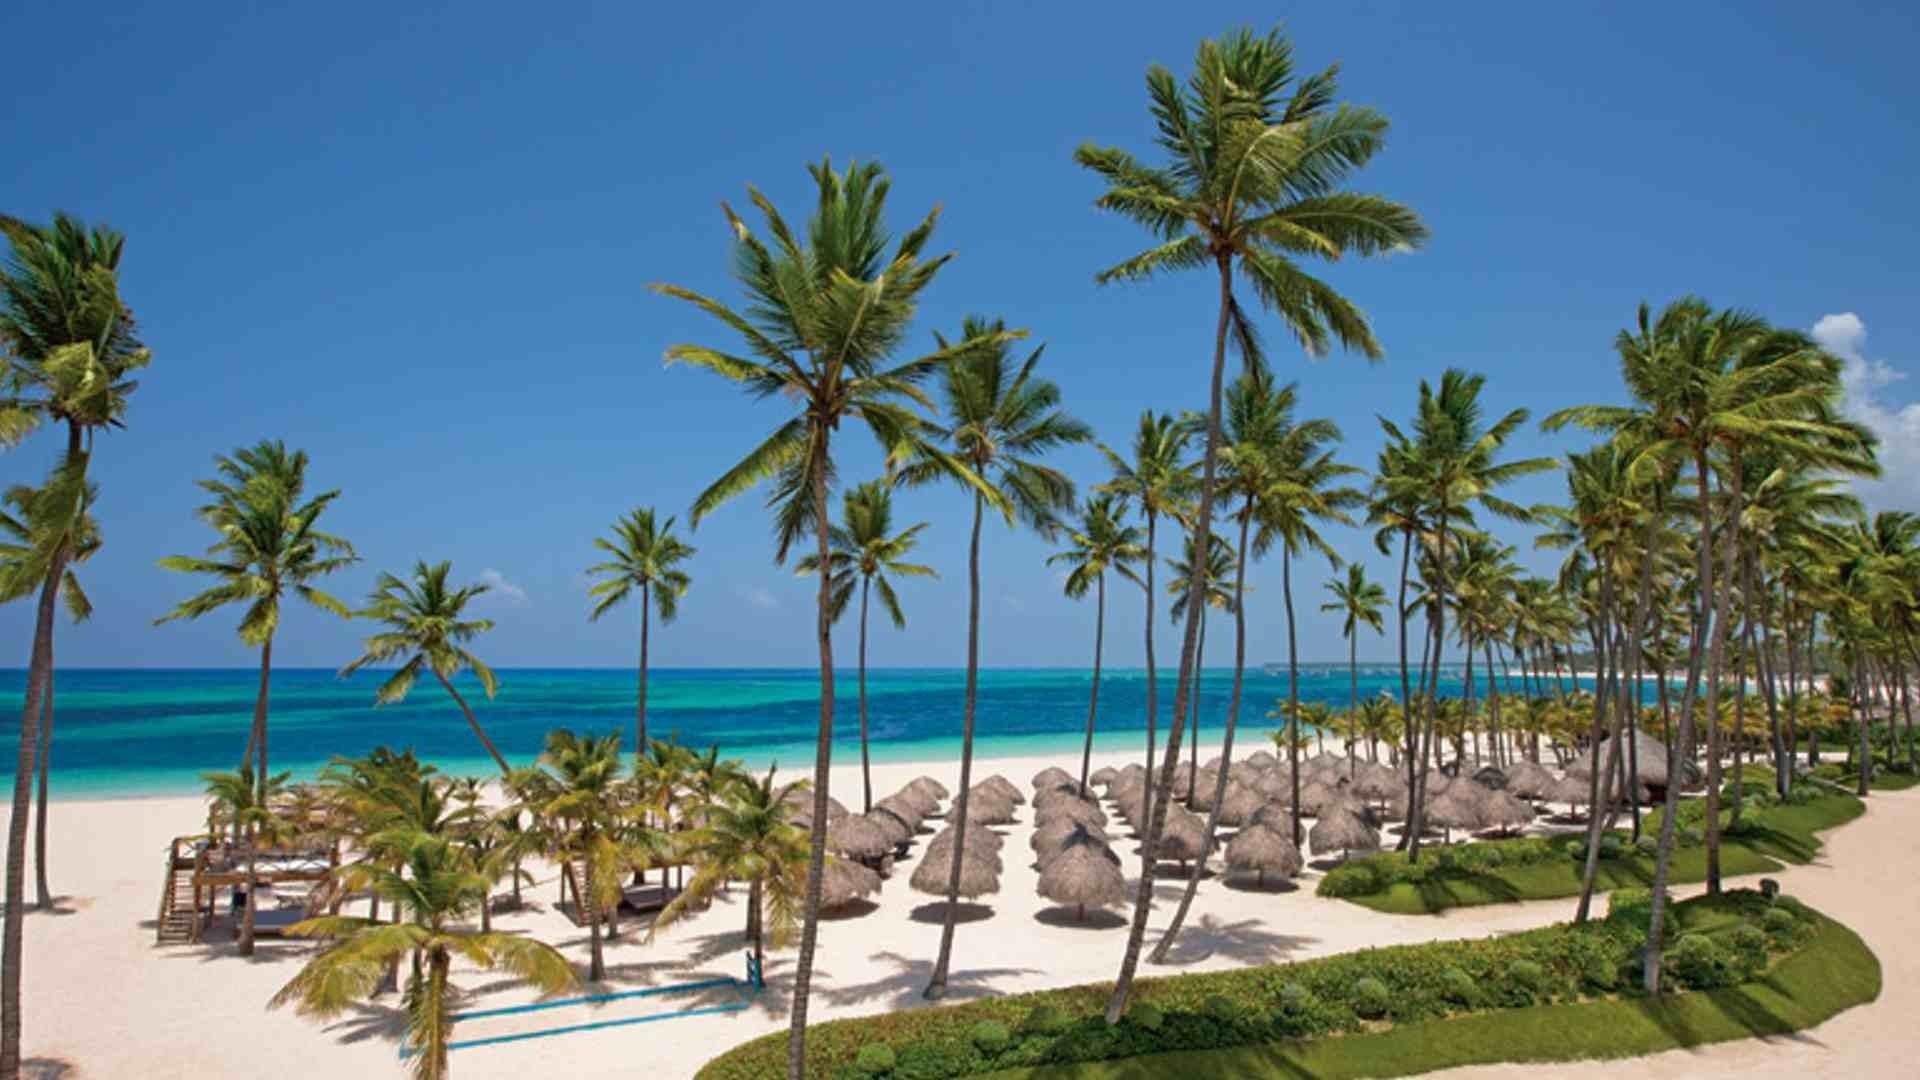 Secrets Royal Beach Punta Cana (NH Royal Beach) Reviews